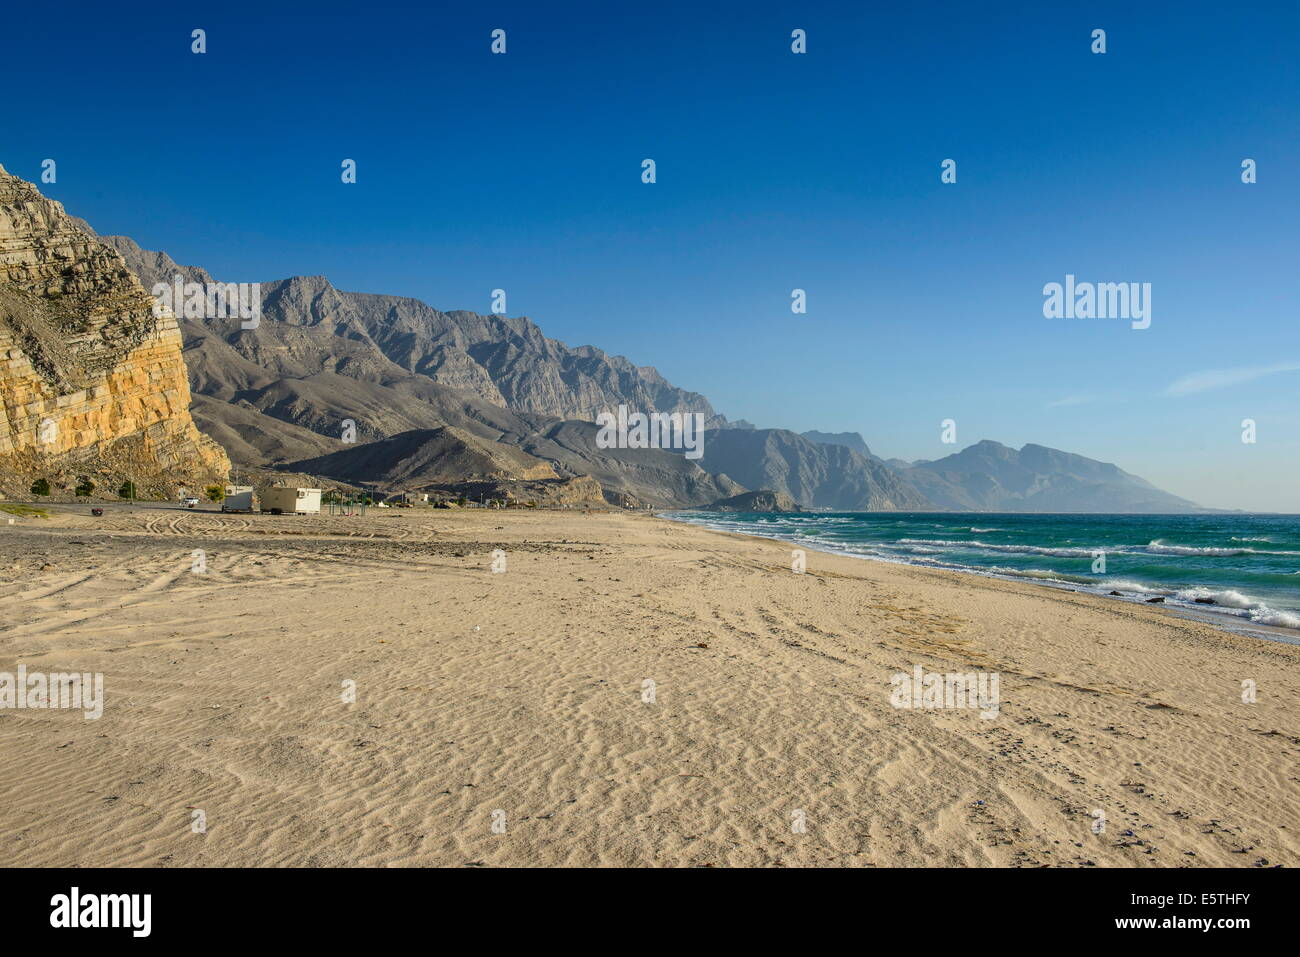 Belle plage à Al Jirri, Kalimantan, Oman, Middle East Photo Stock